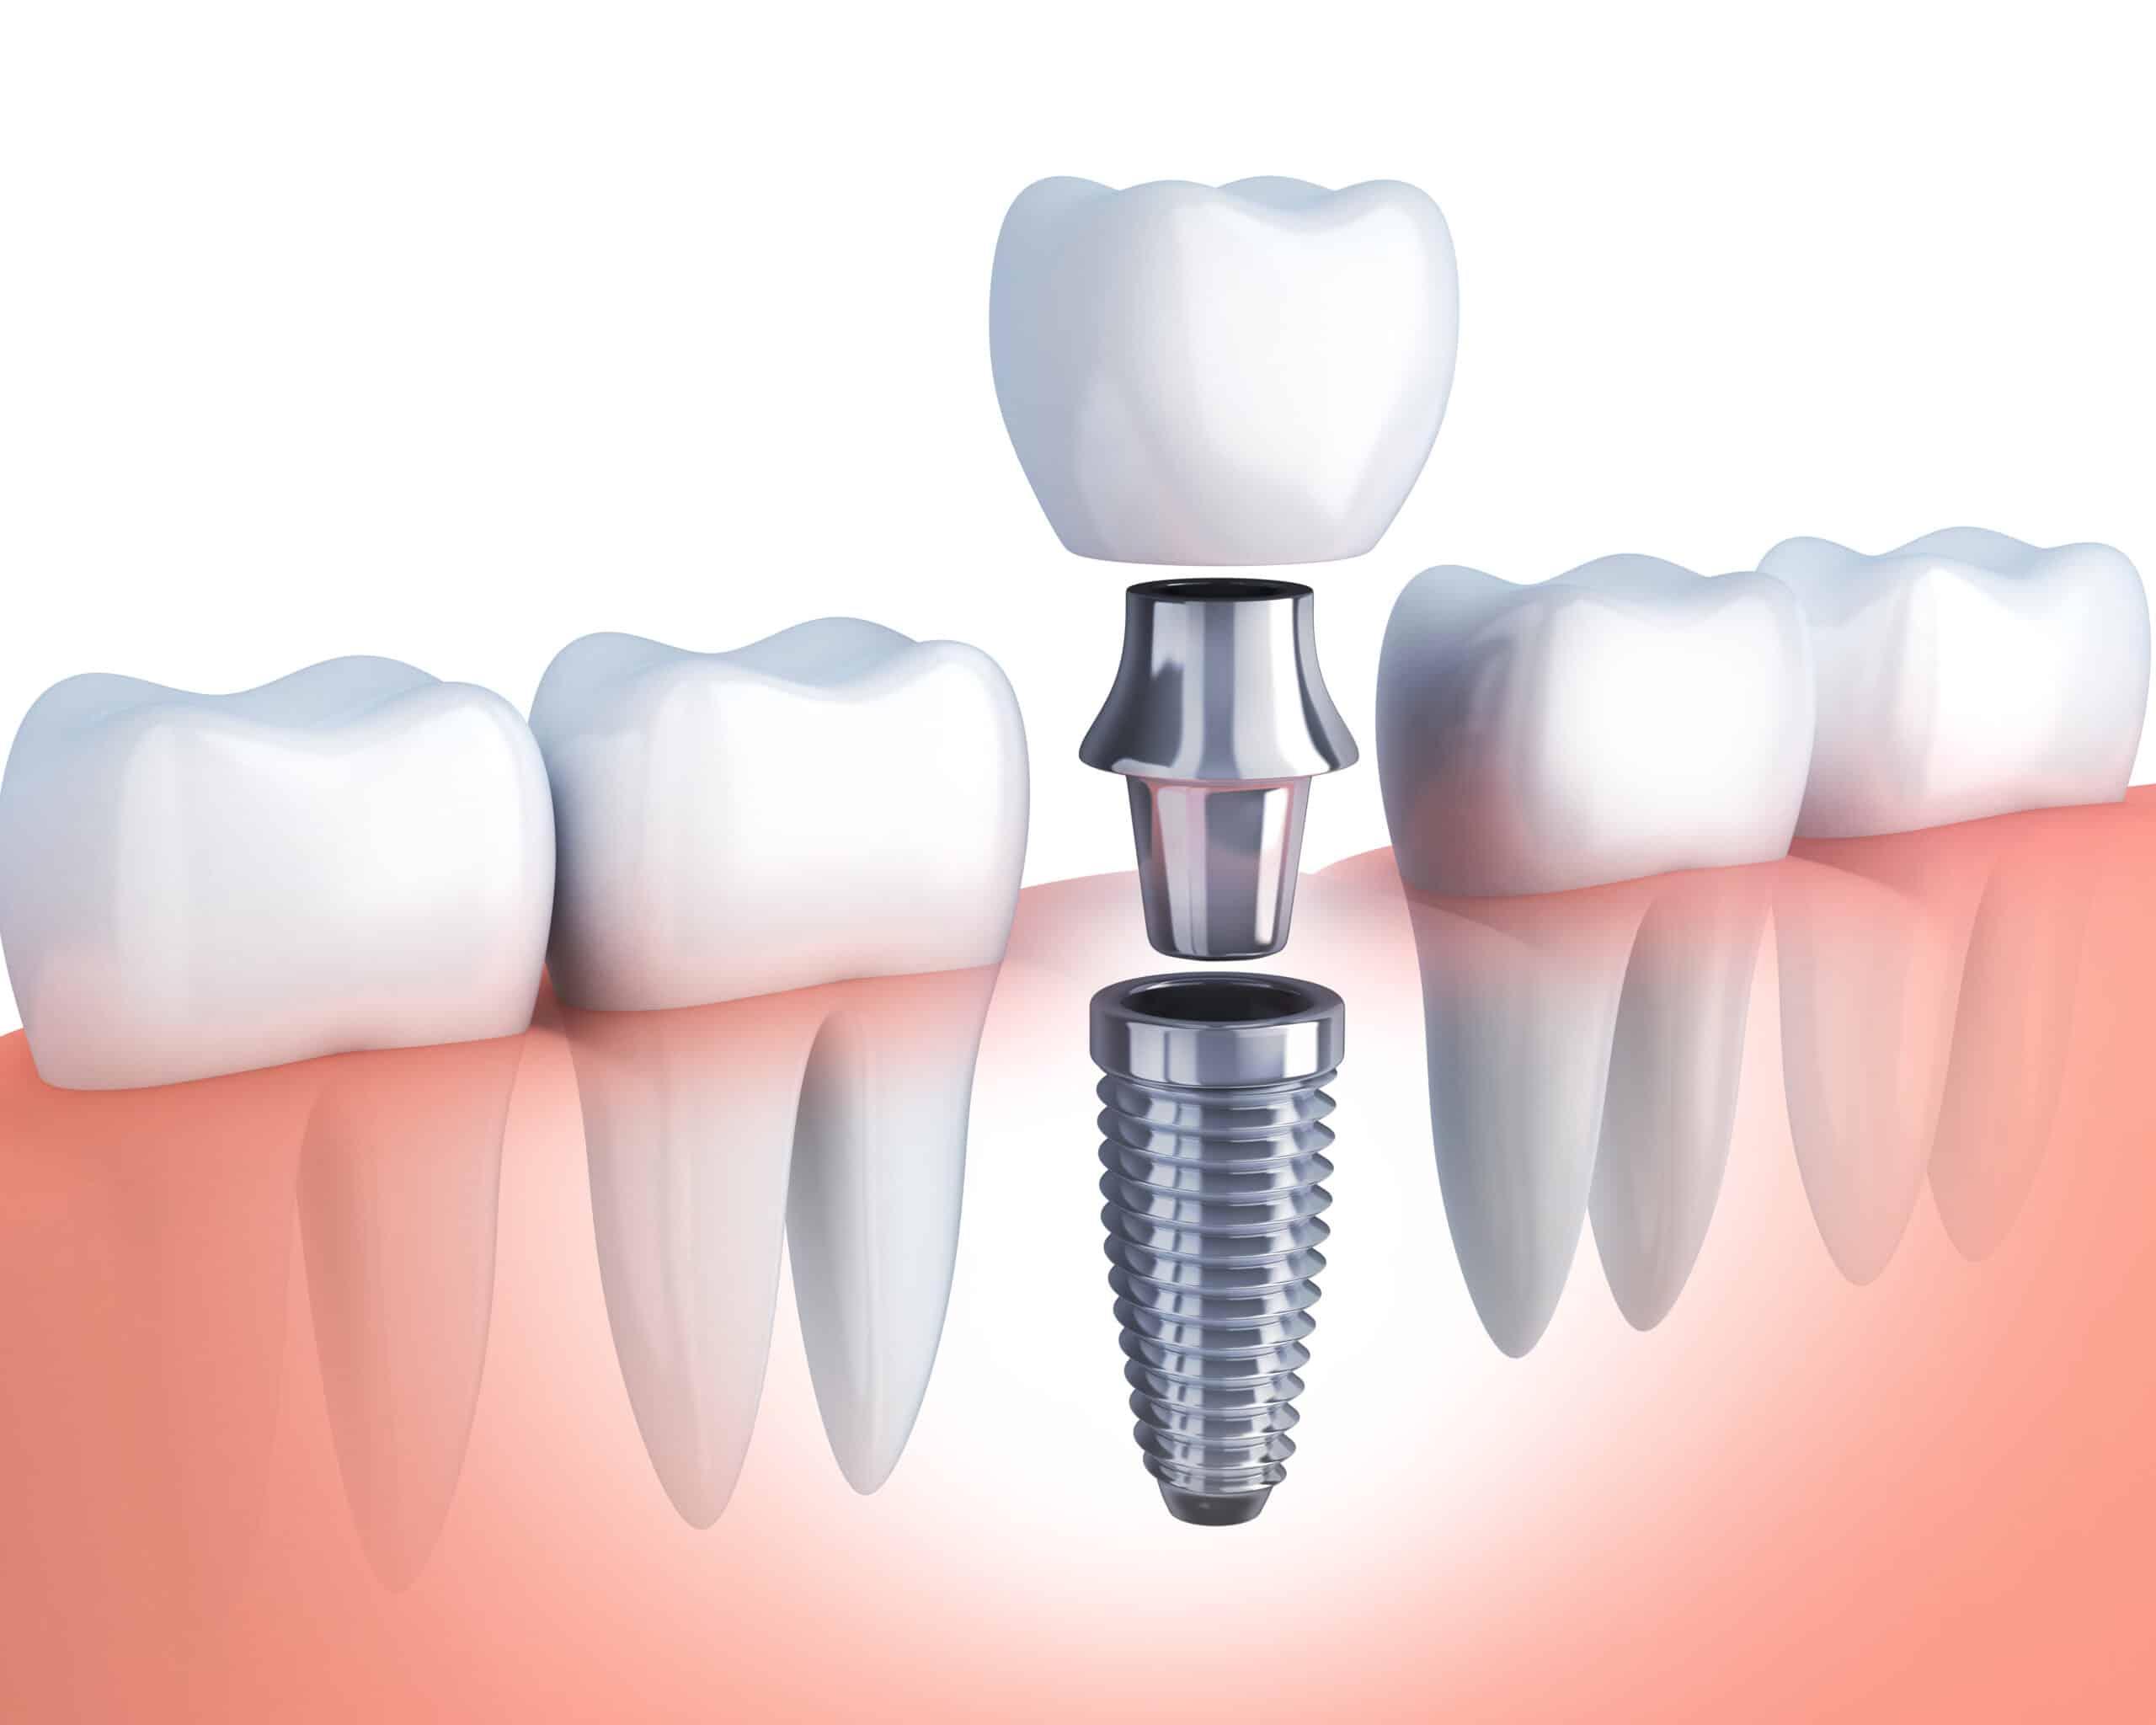 https://dentrum.pl/wp-content/uploads/implantologia-1-scaled.jpg